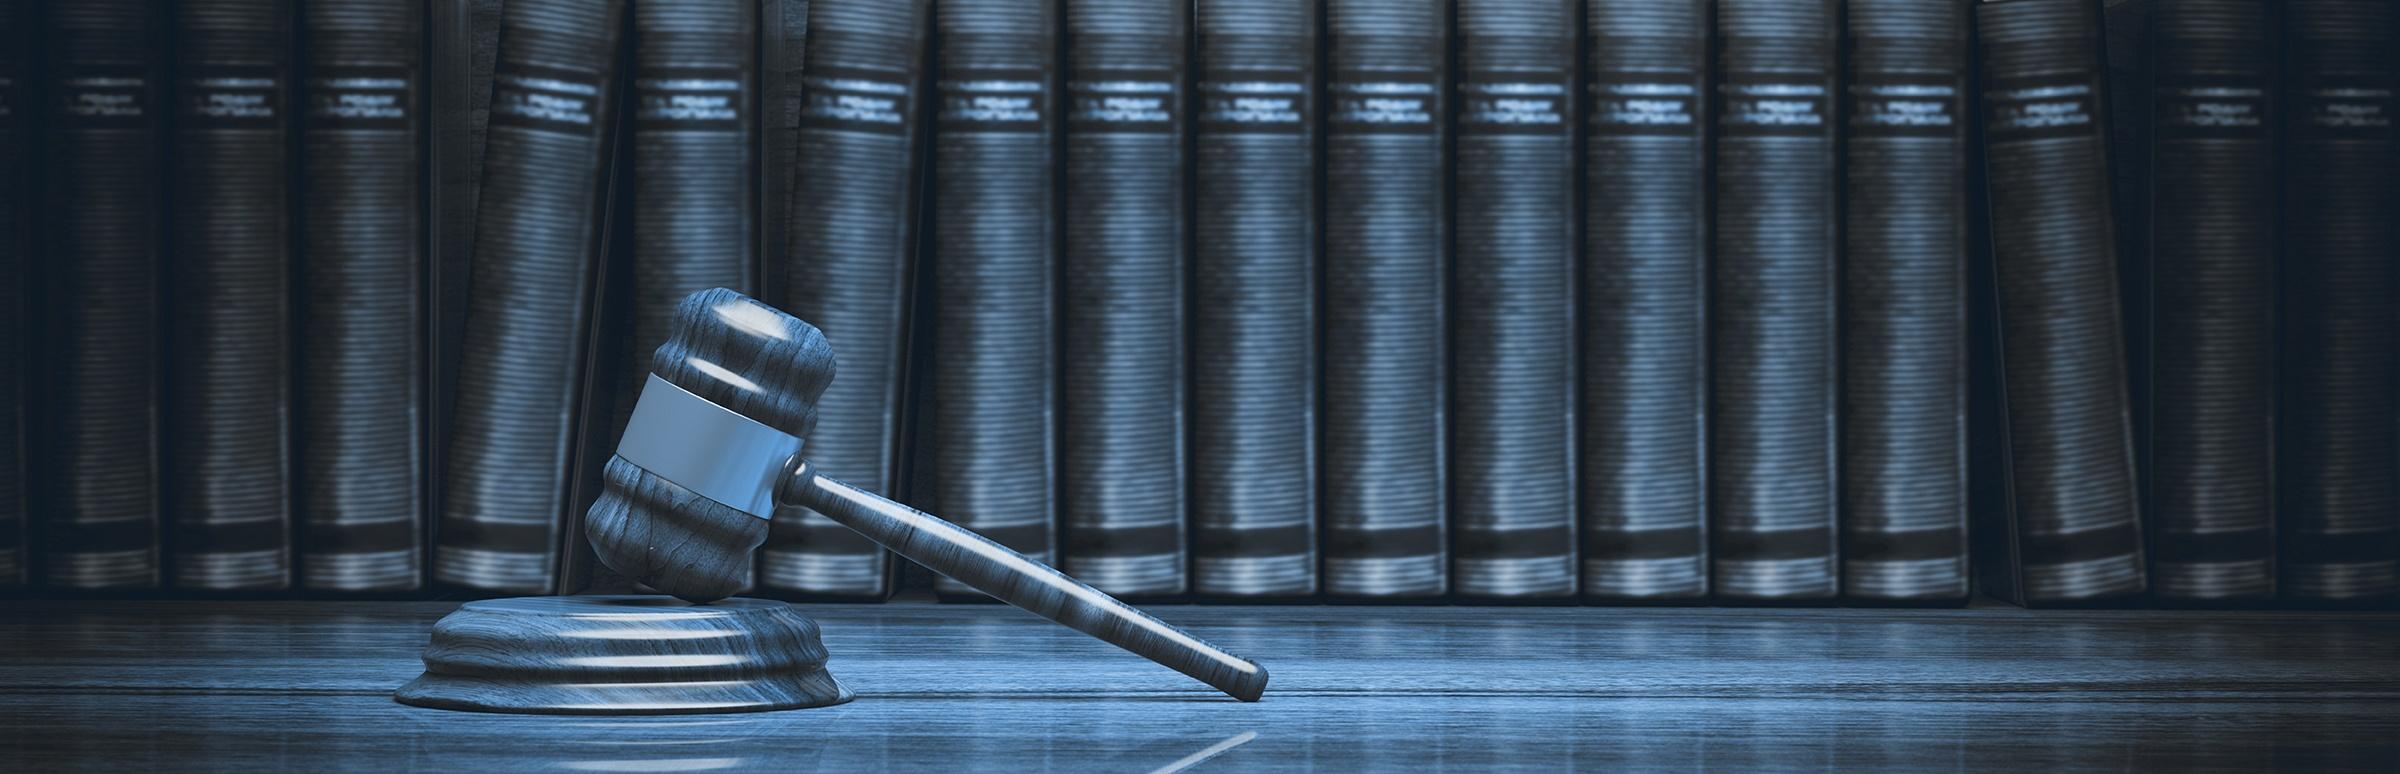 law books02.jpg